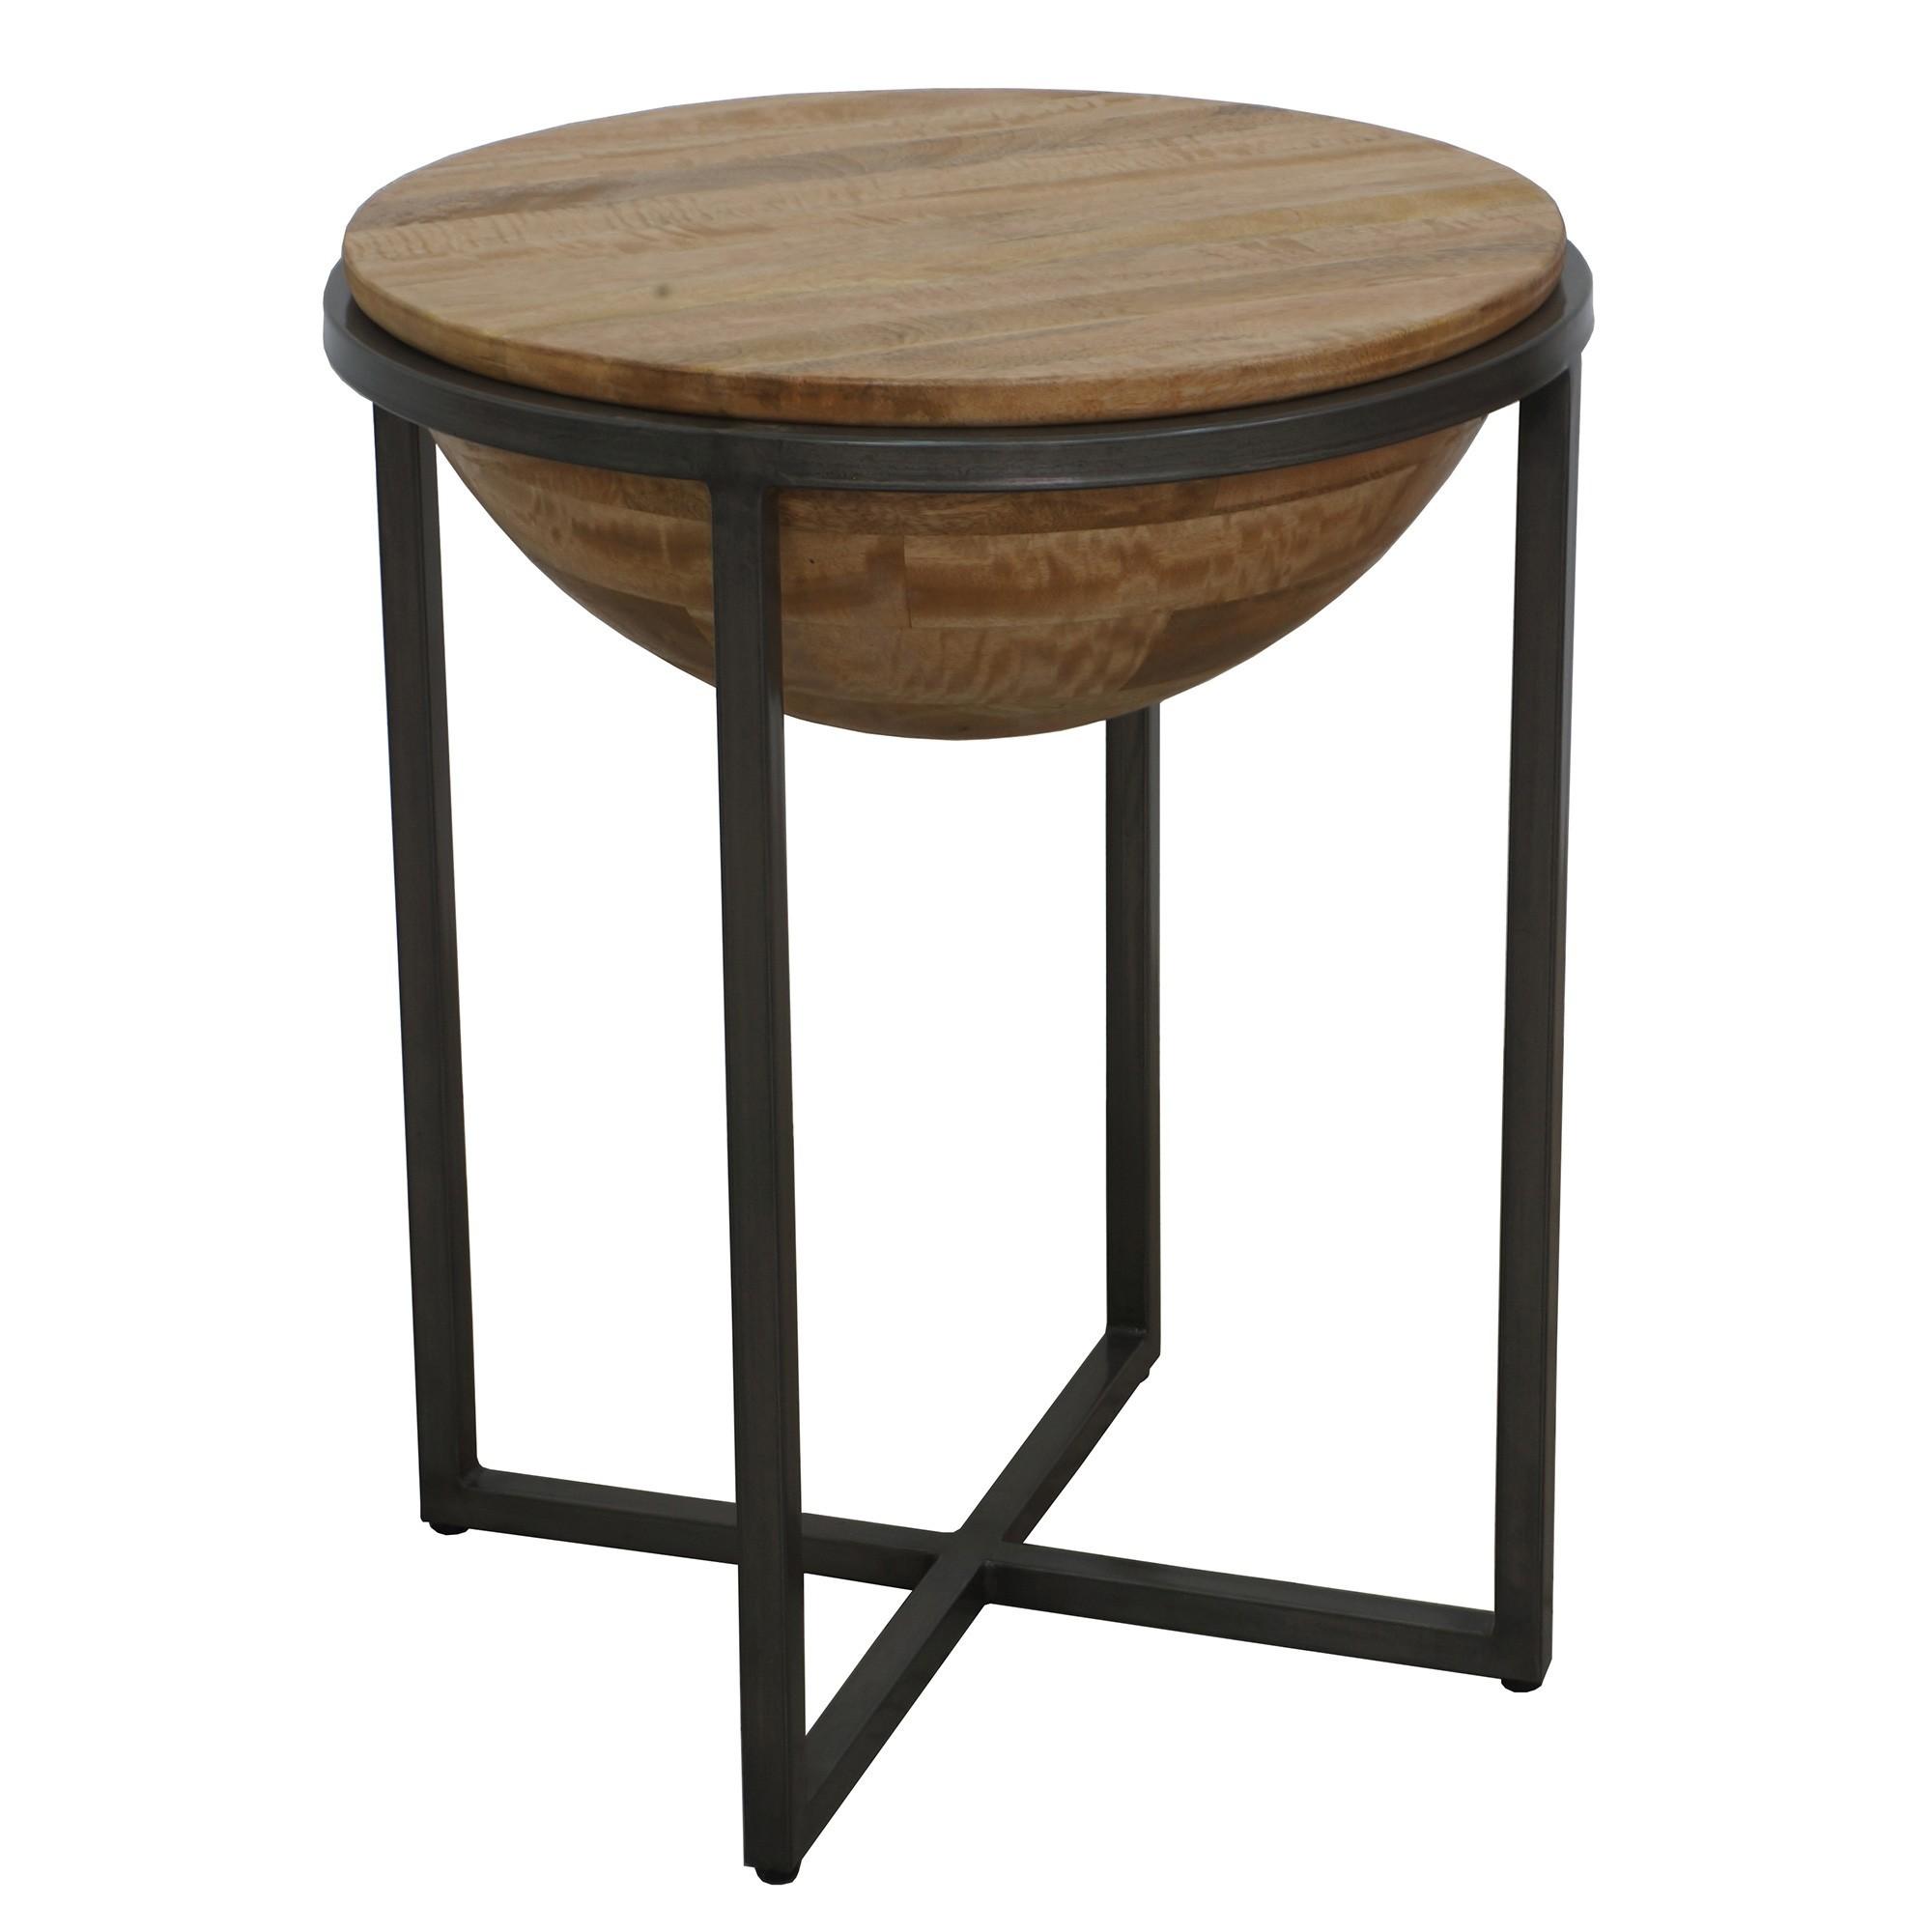 Bodet Mango Wood & Metal Round Side Table